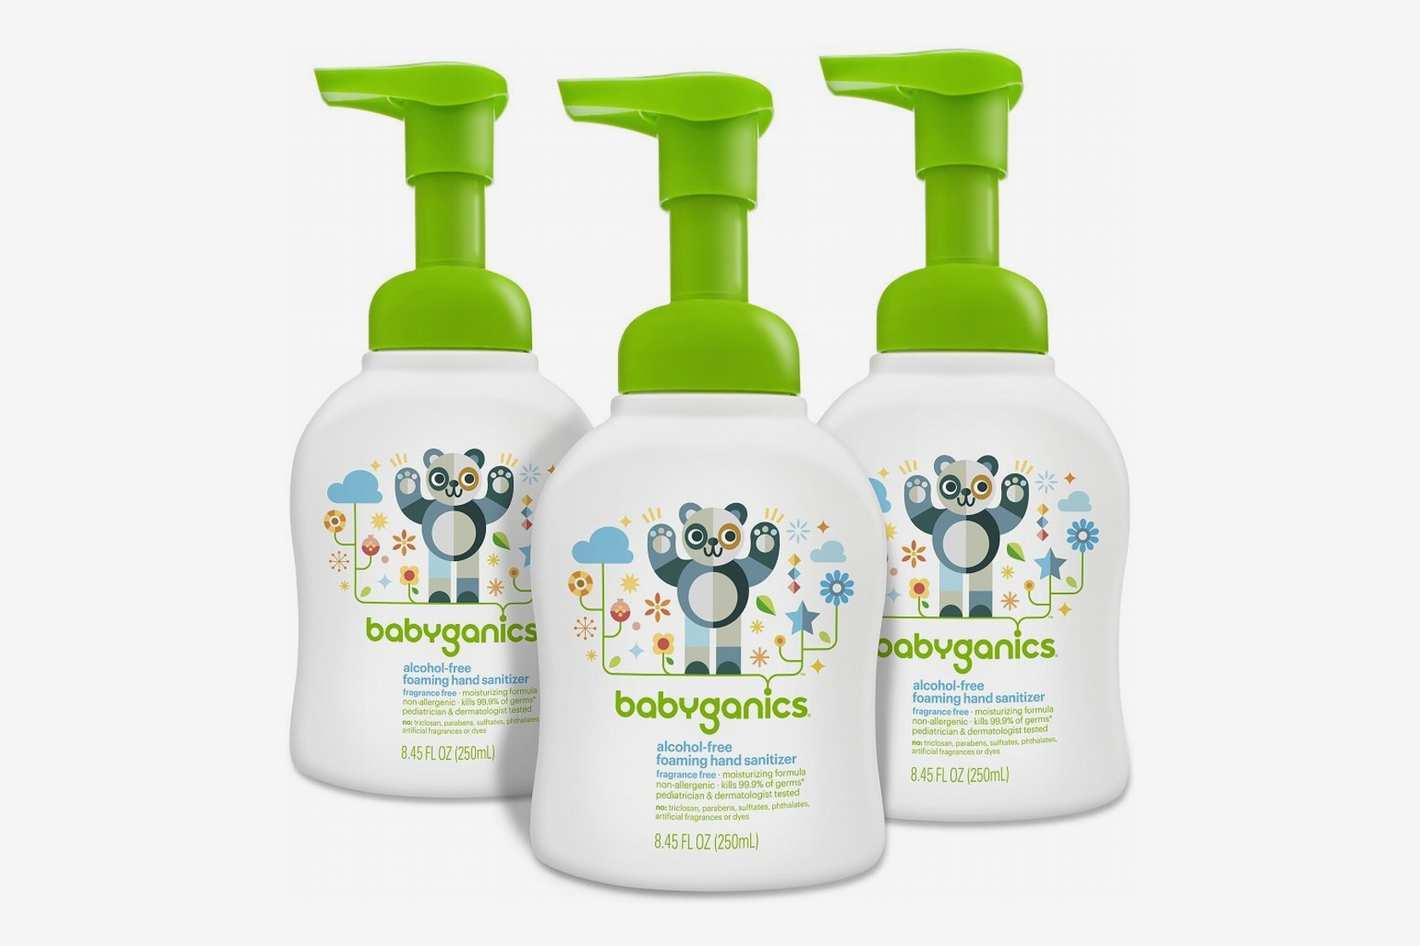 Babyganics Alcohol-Free Foaming Hand Sanitizer - 3 Pack